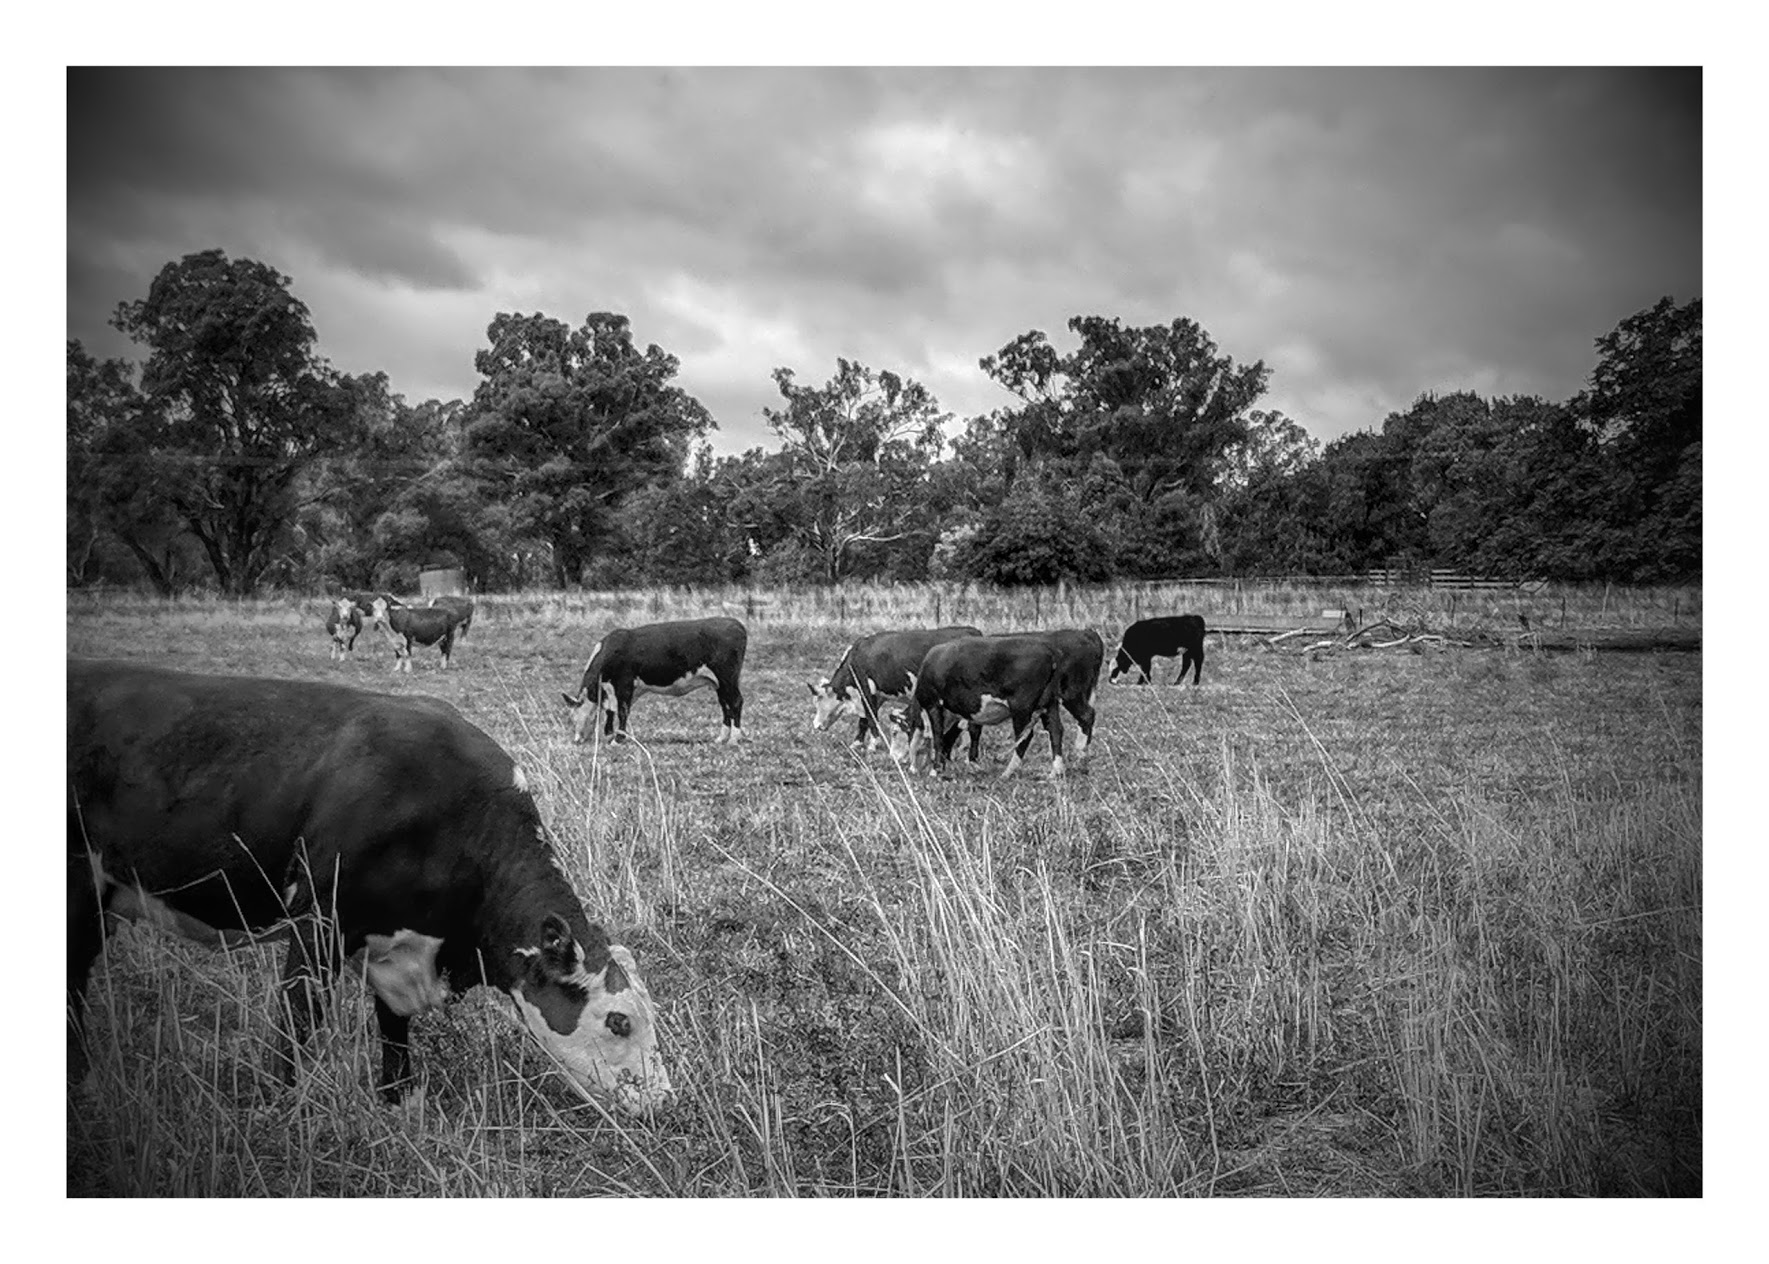 Cattle in Australia.